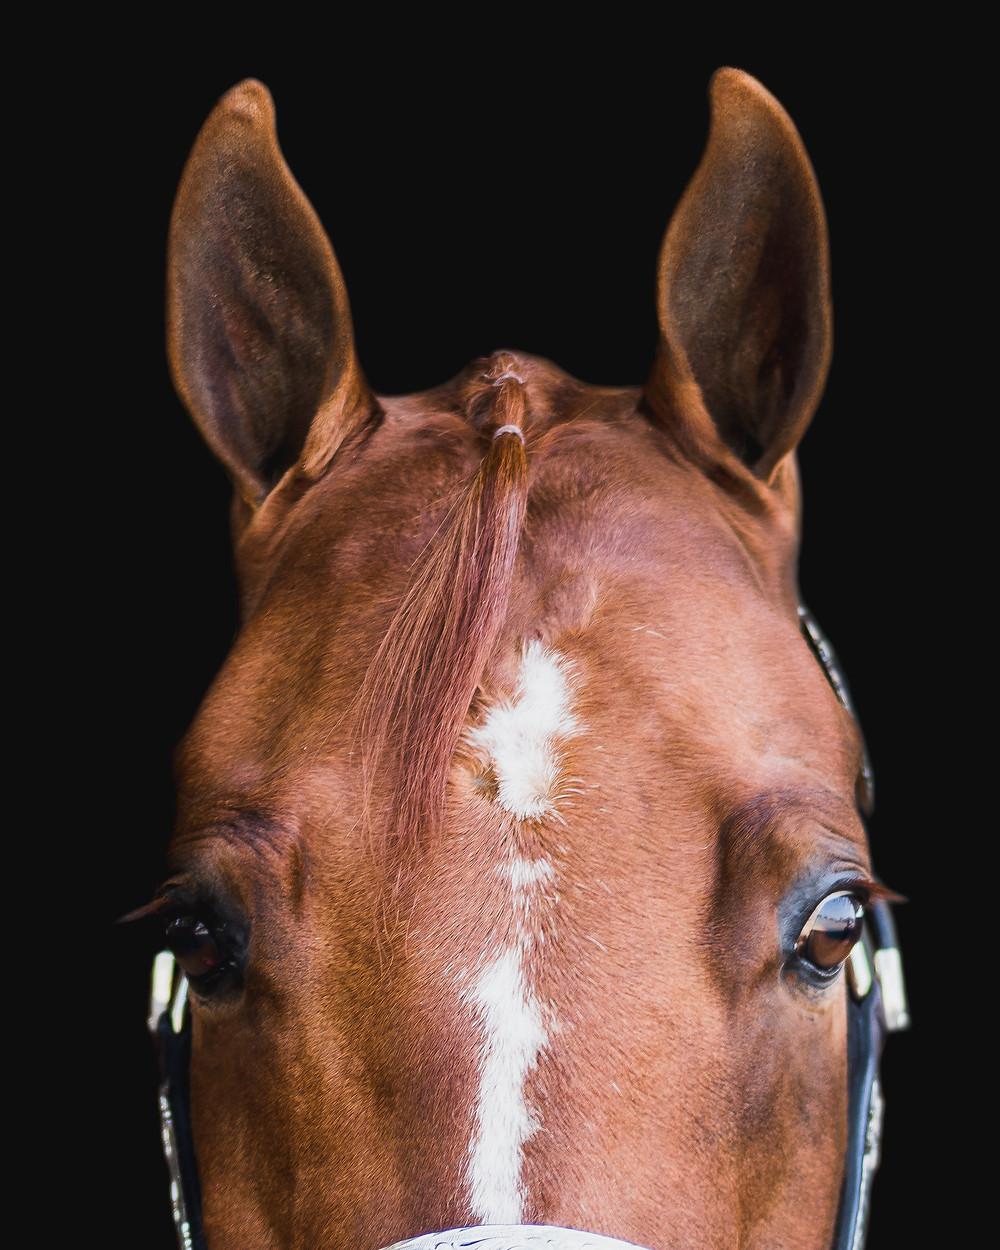 artistic horse photo